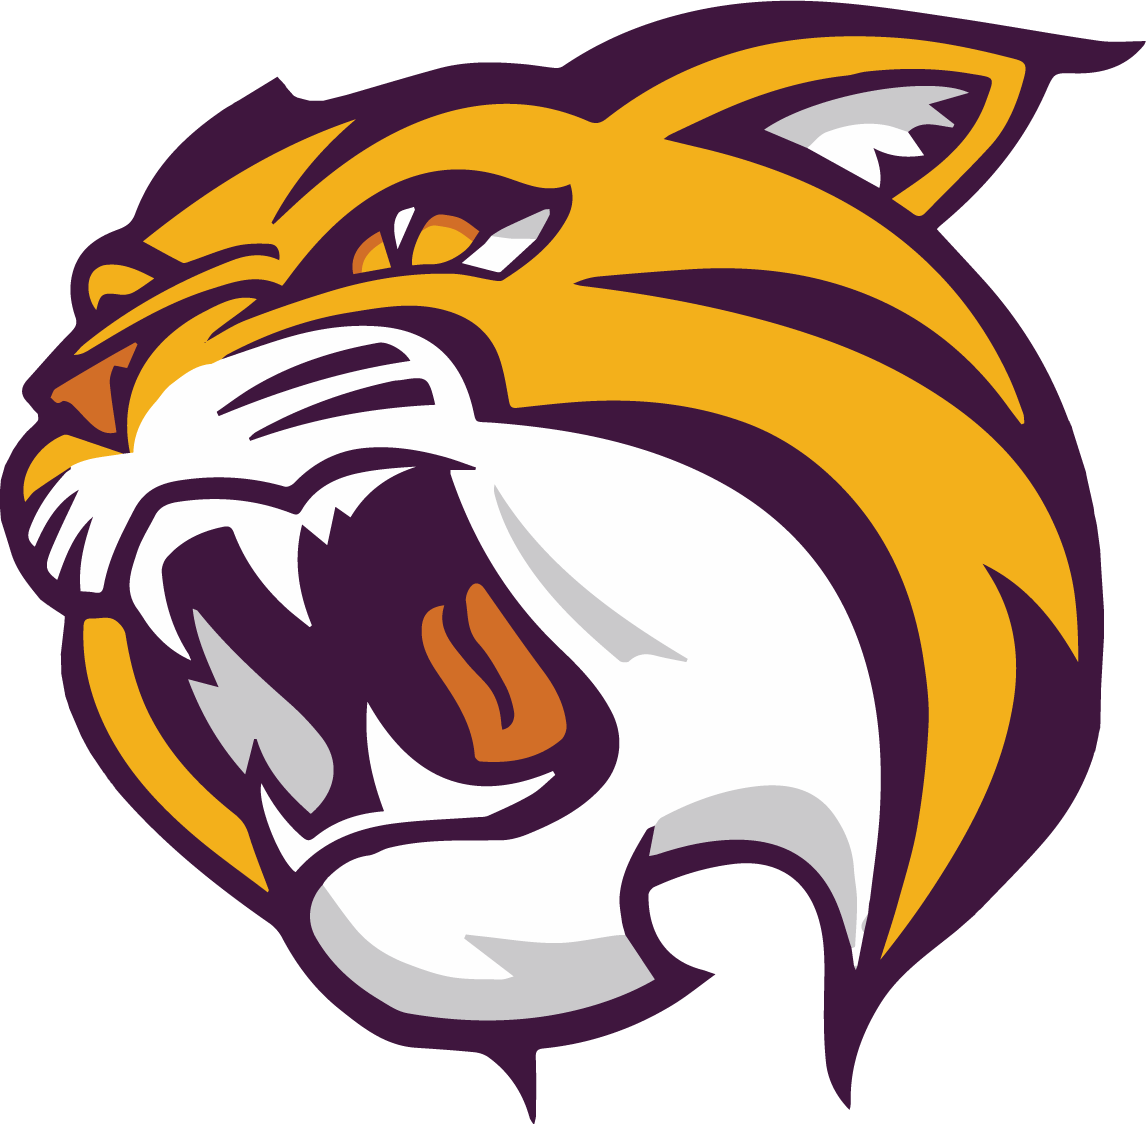 Wildcat school mascot clipart svg library stock Wild Rose School District svg library stock